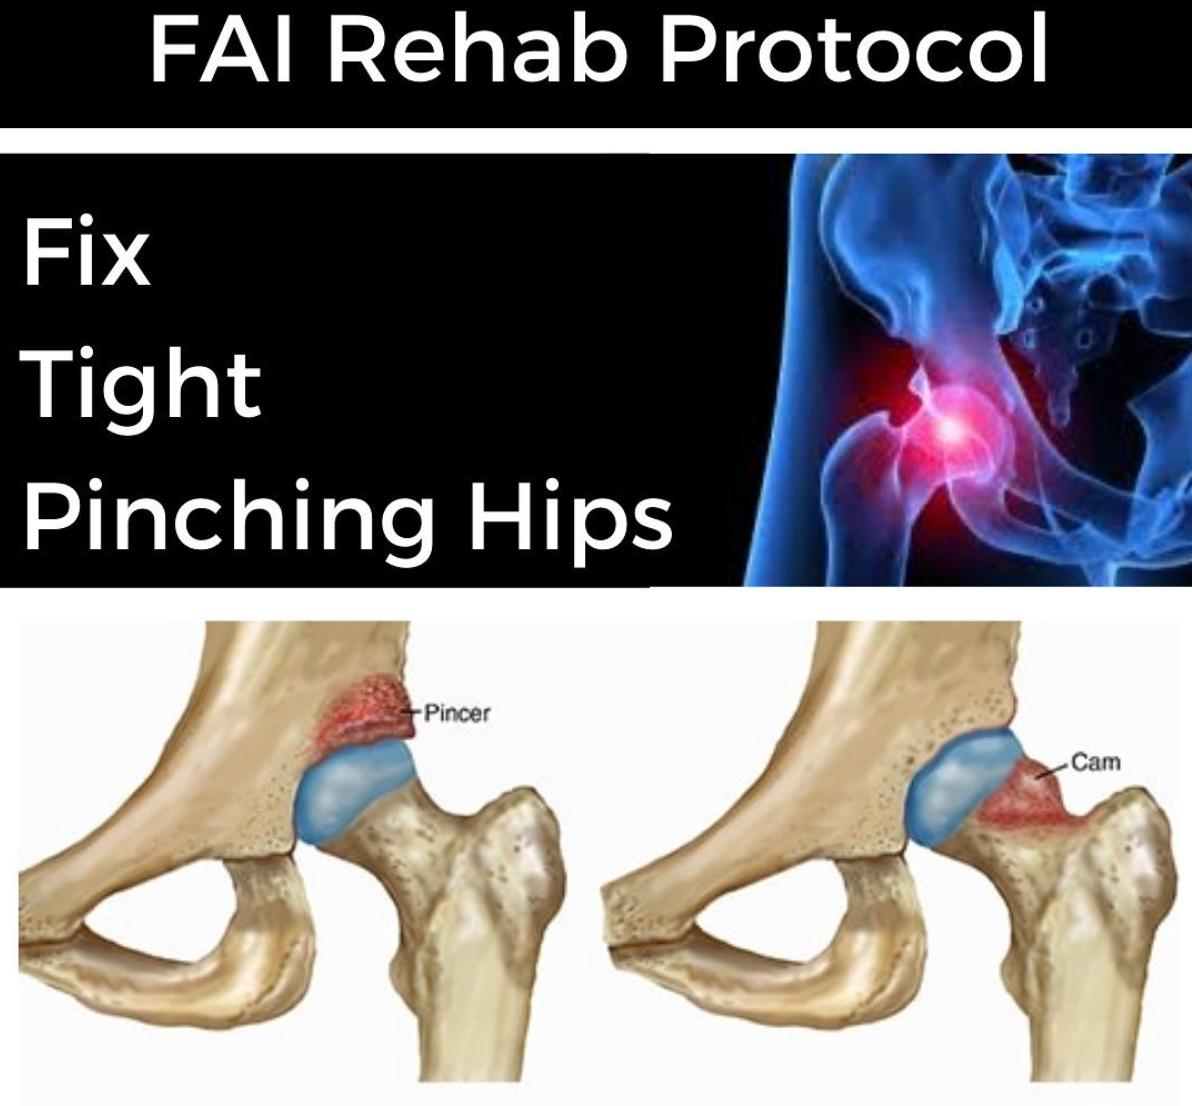 FAI Rehab Protocol Part 1 - themanualtherapist.com